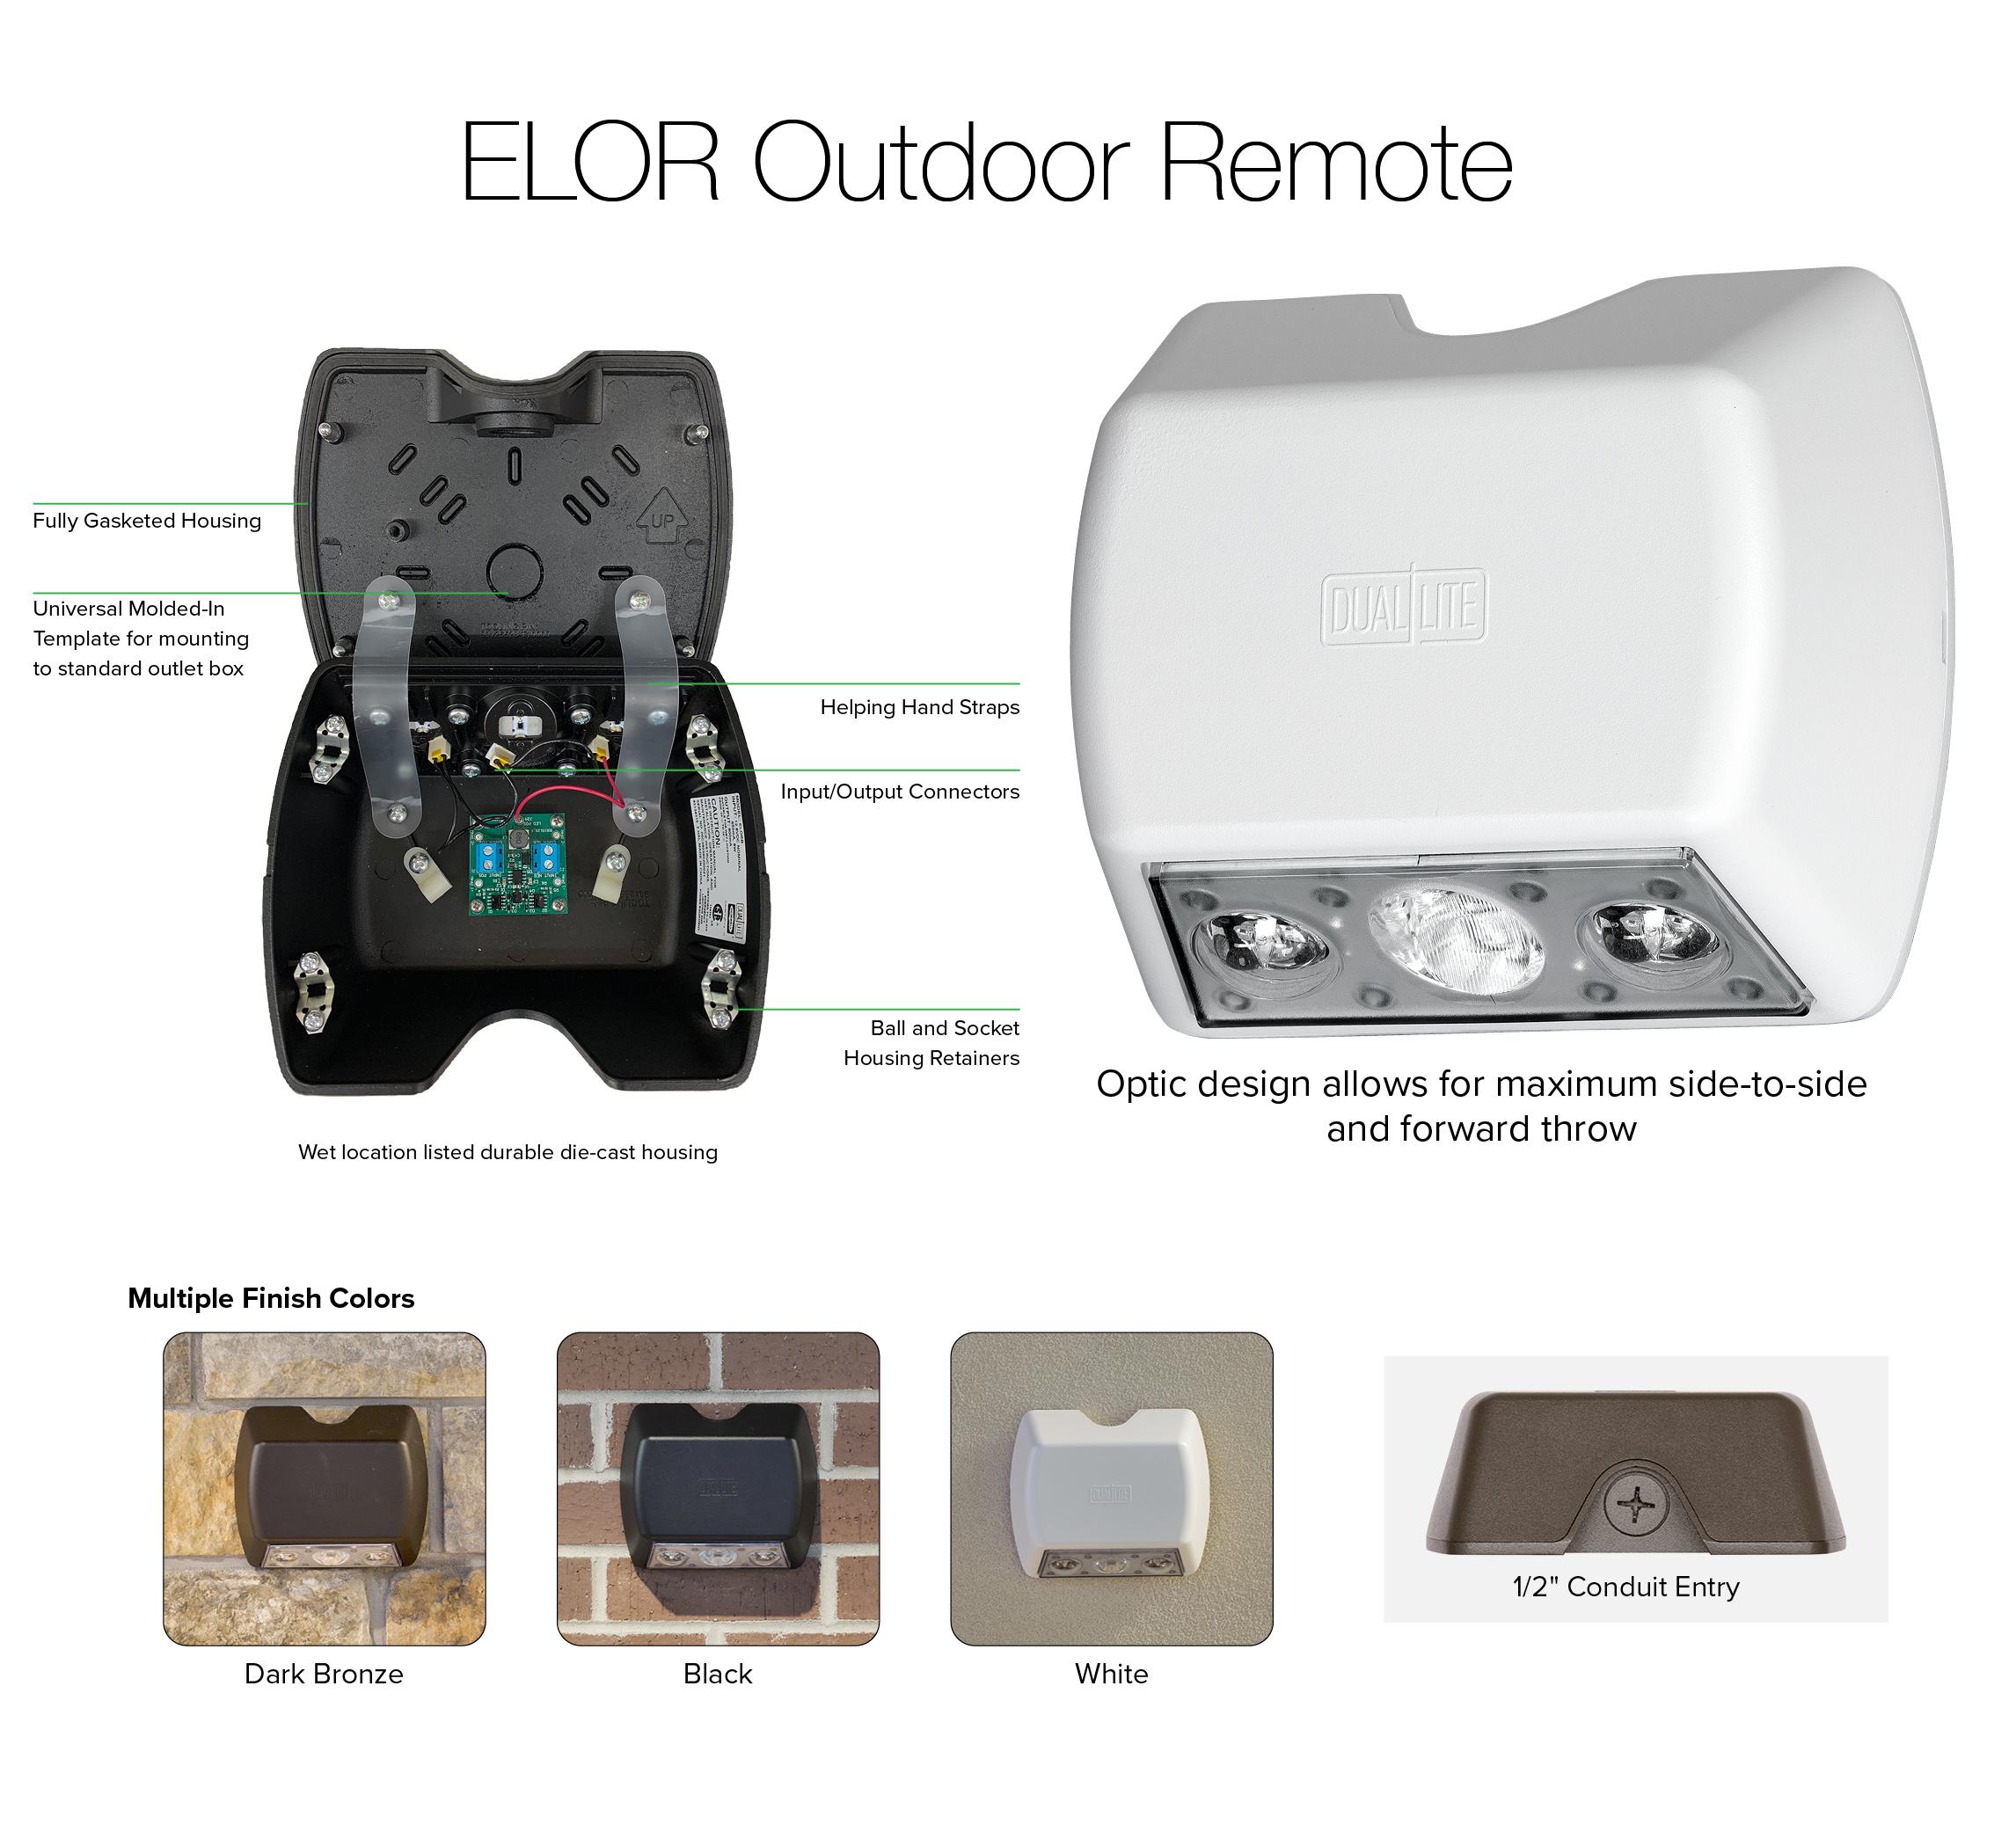 ELSS Outdoor Remote